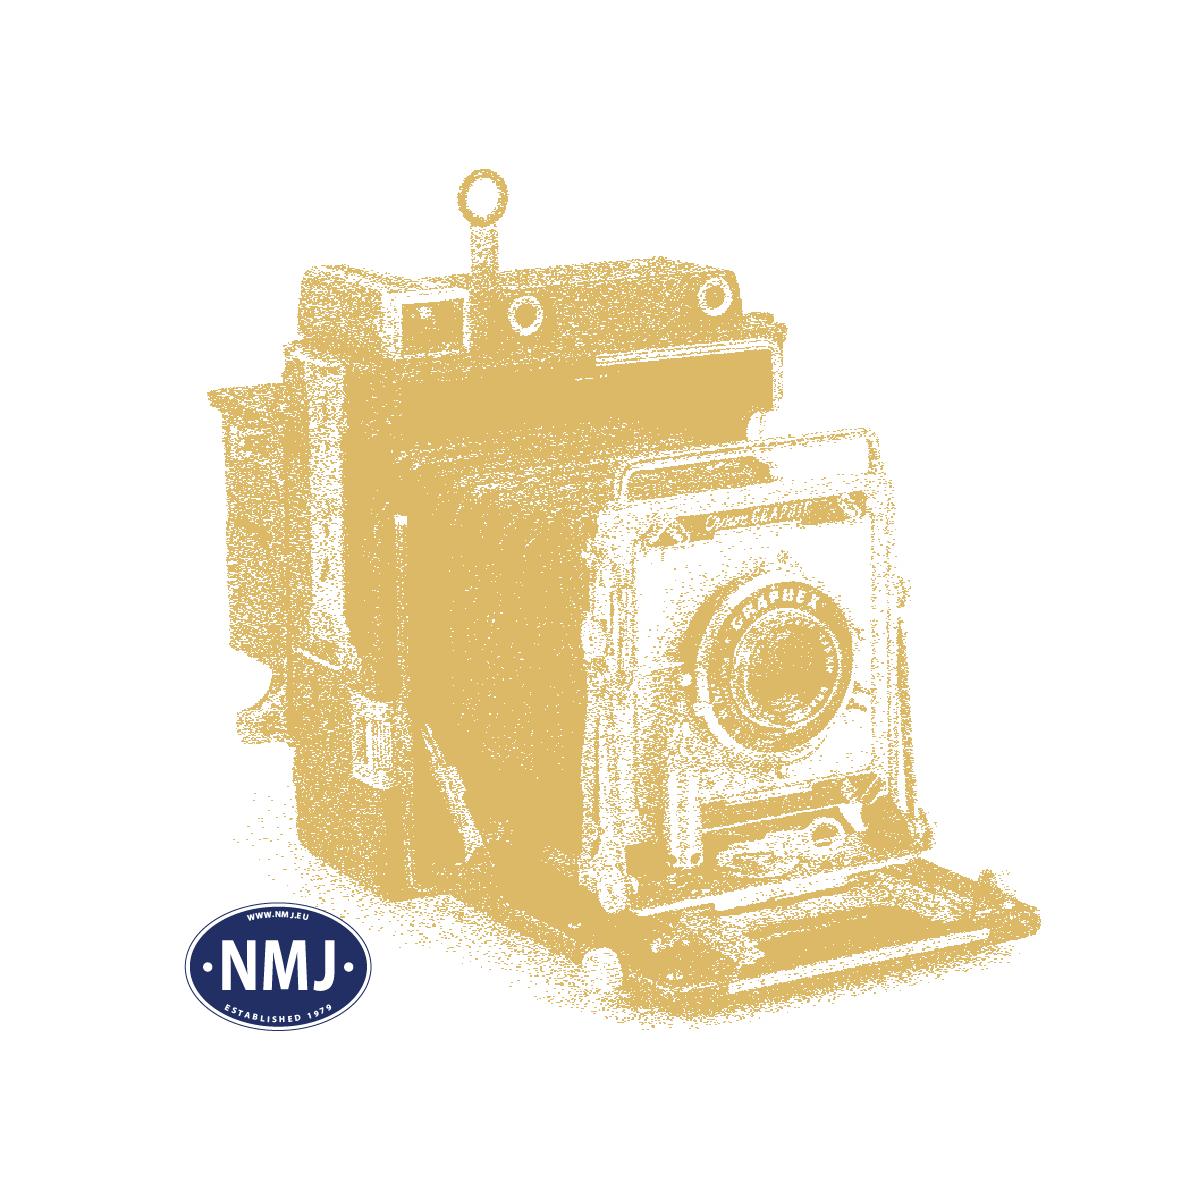 NMJT503.109 - NMJ Topline Gbkl 118 4215-5 Güterwagen der NSB